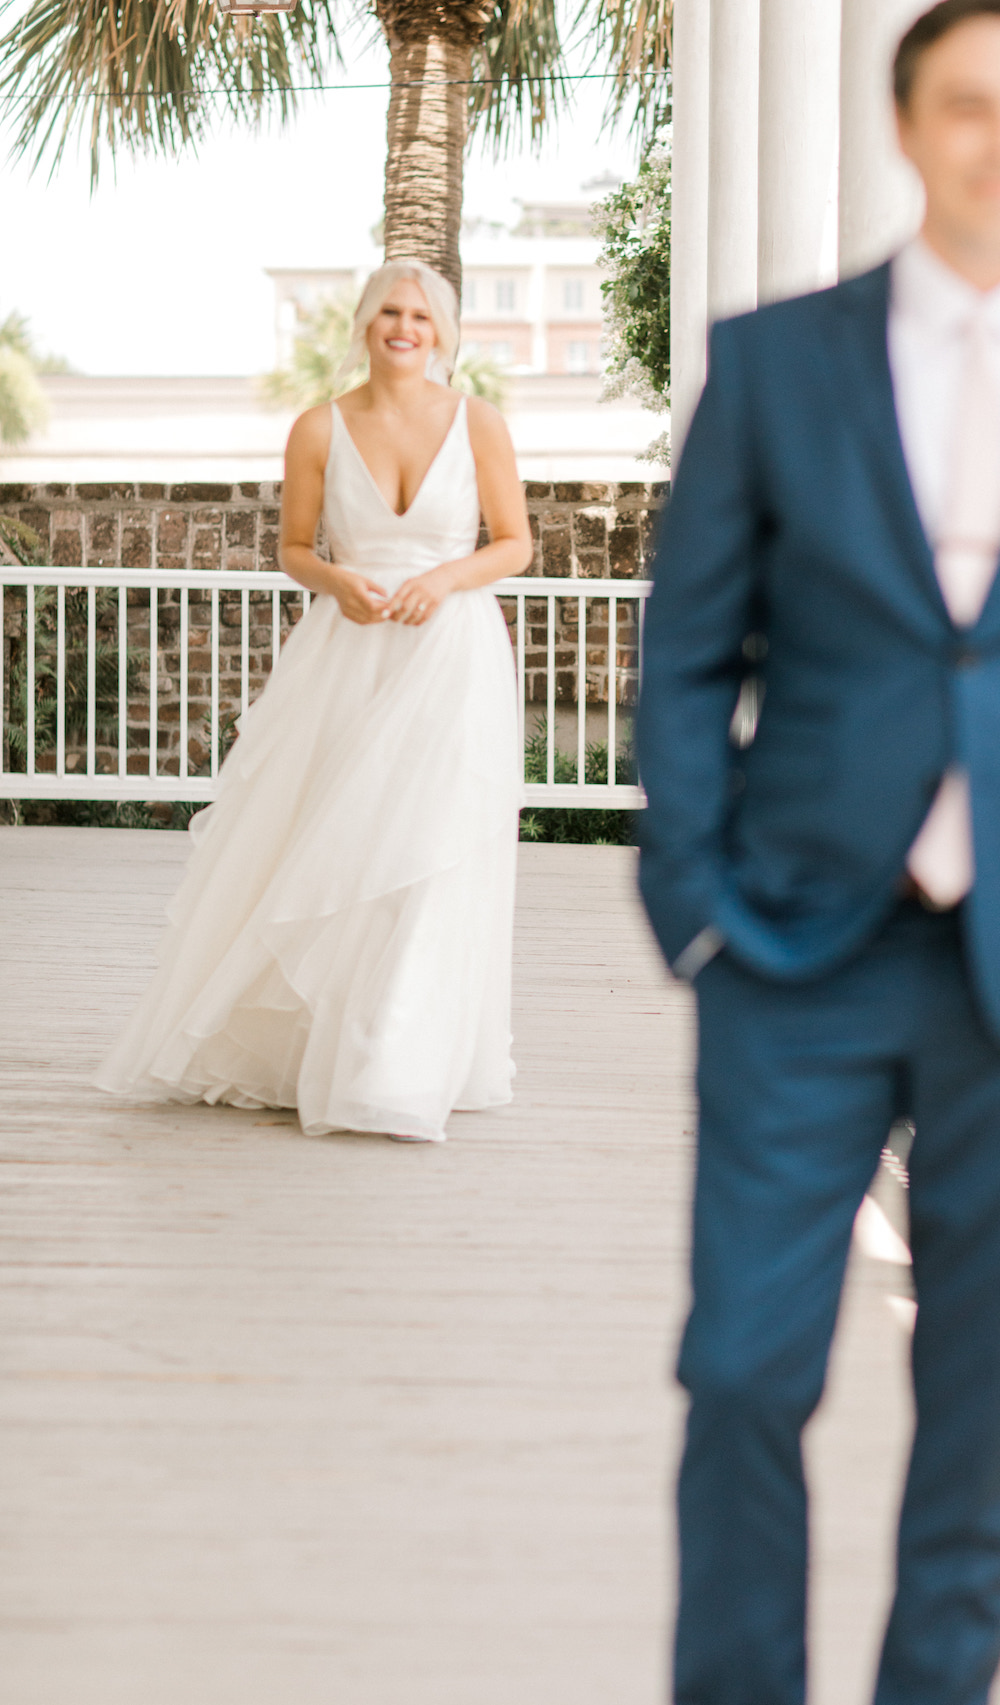 Bride walking towards groom facing away